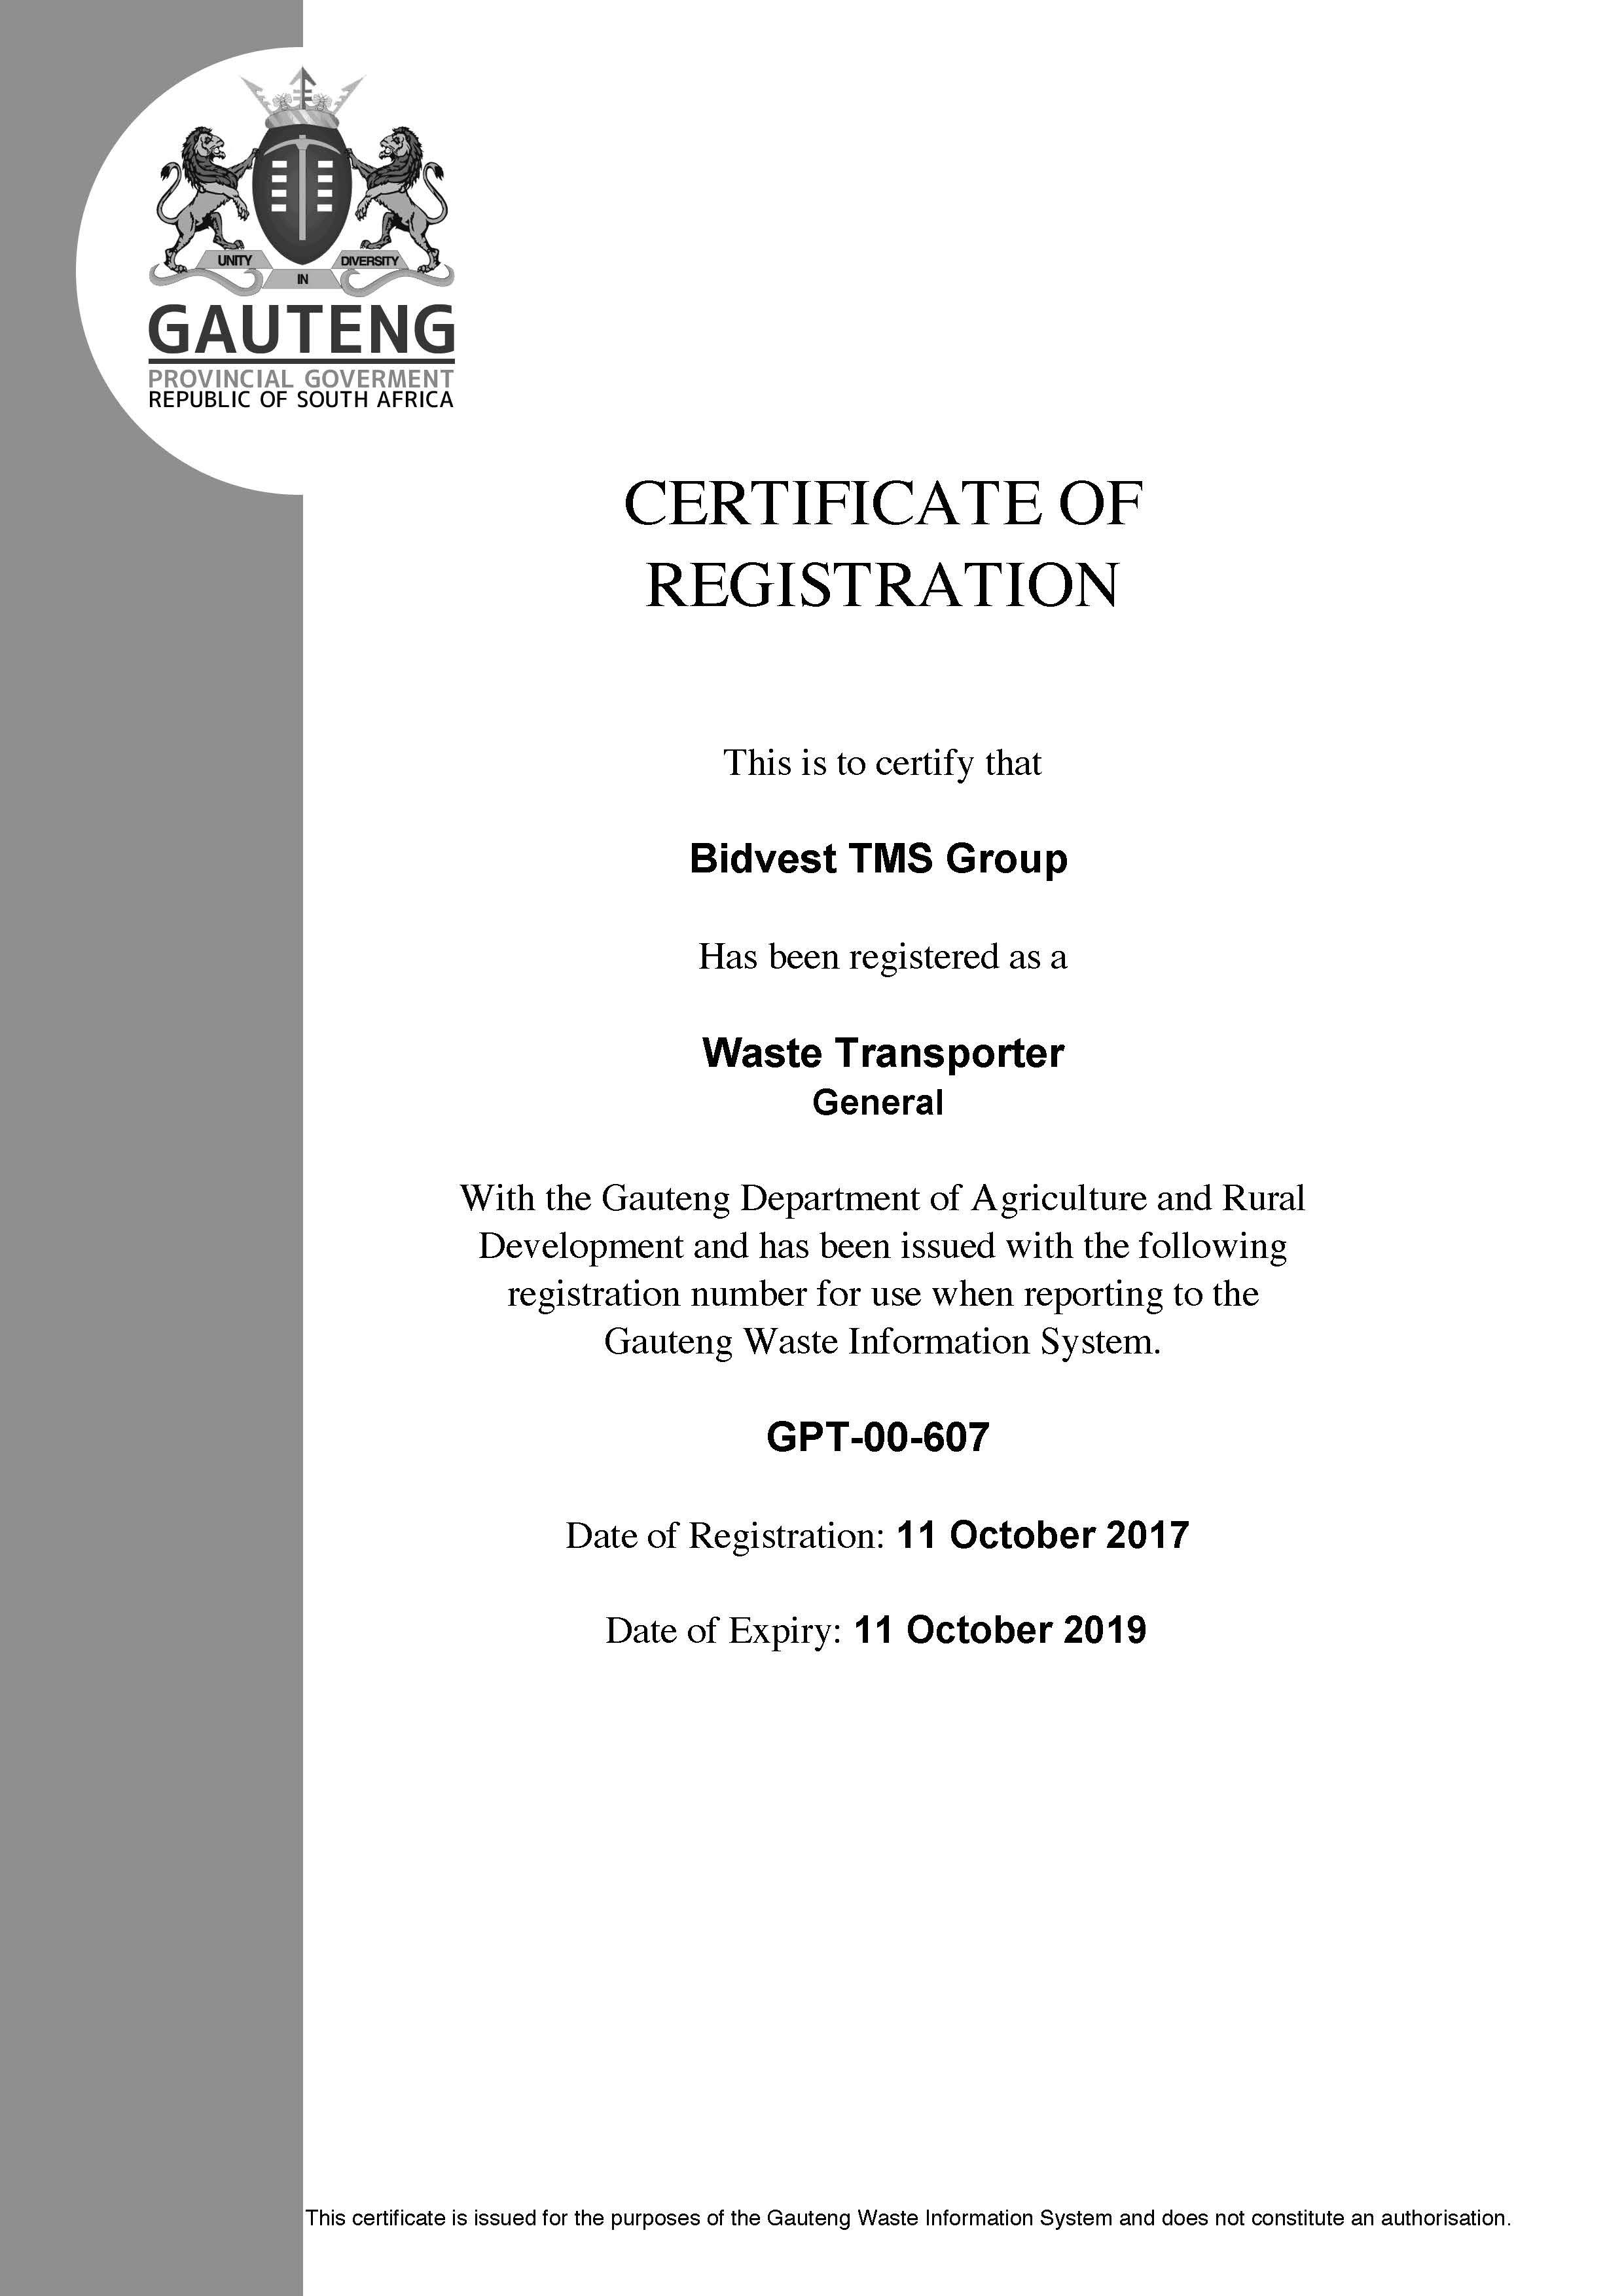 Bidvest TMS Group Vaal